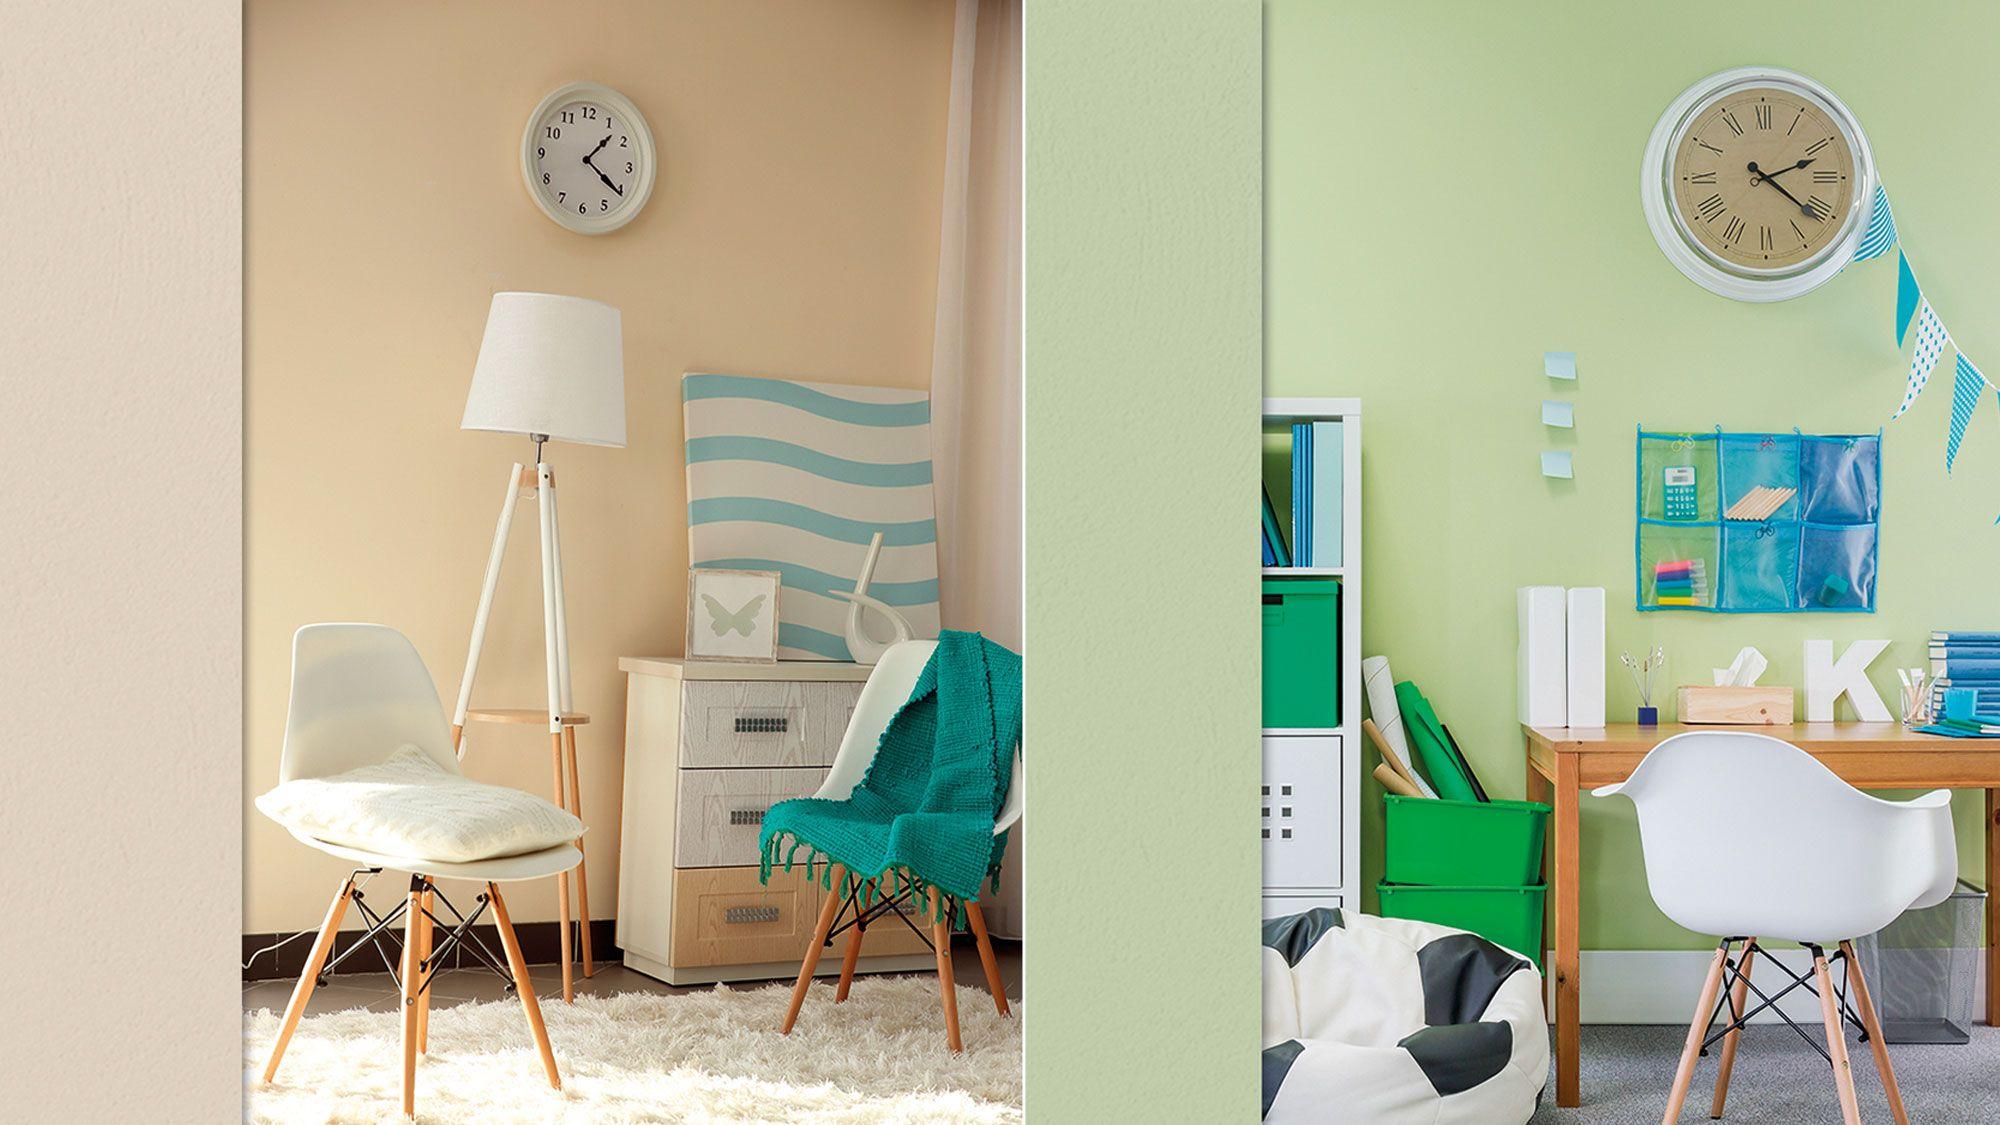 Pintura ecol gica para interior y exterior hogarmania for Pintura pared interior colores